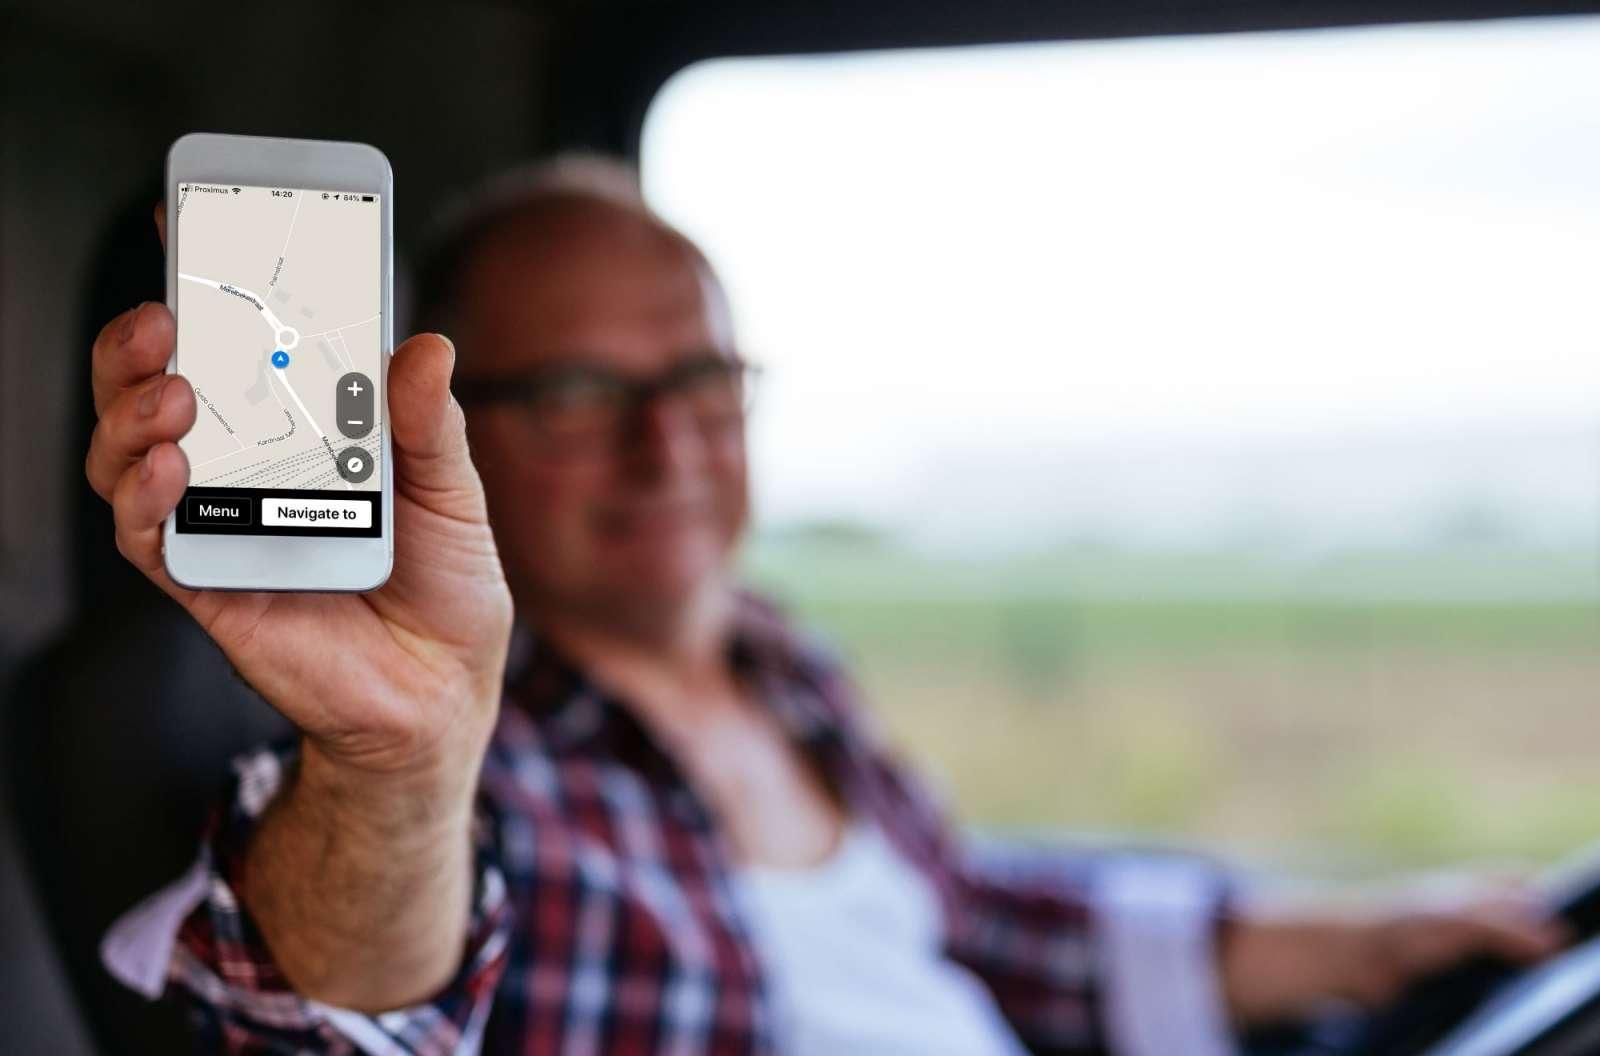 Logistics platform driver app